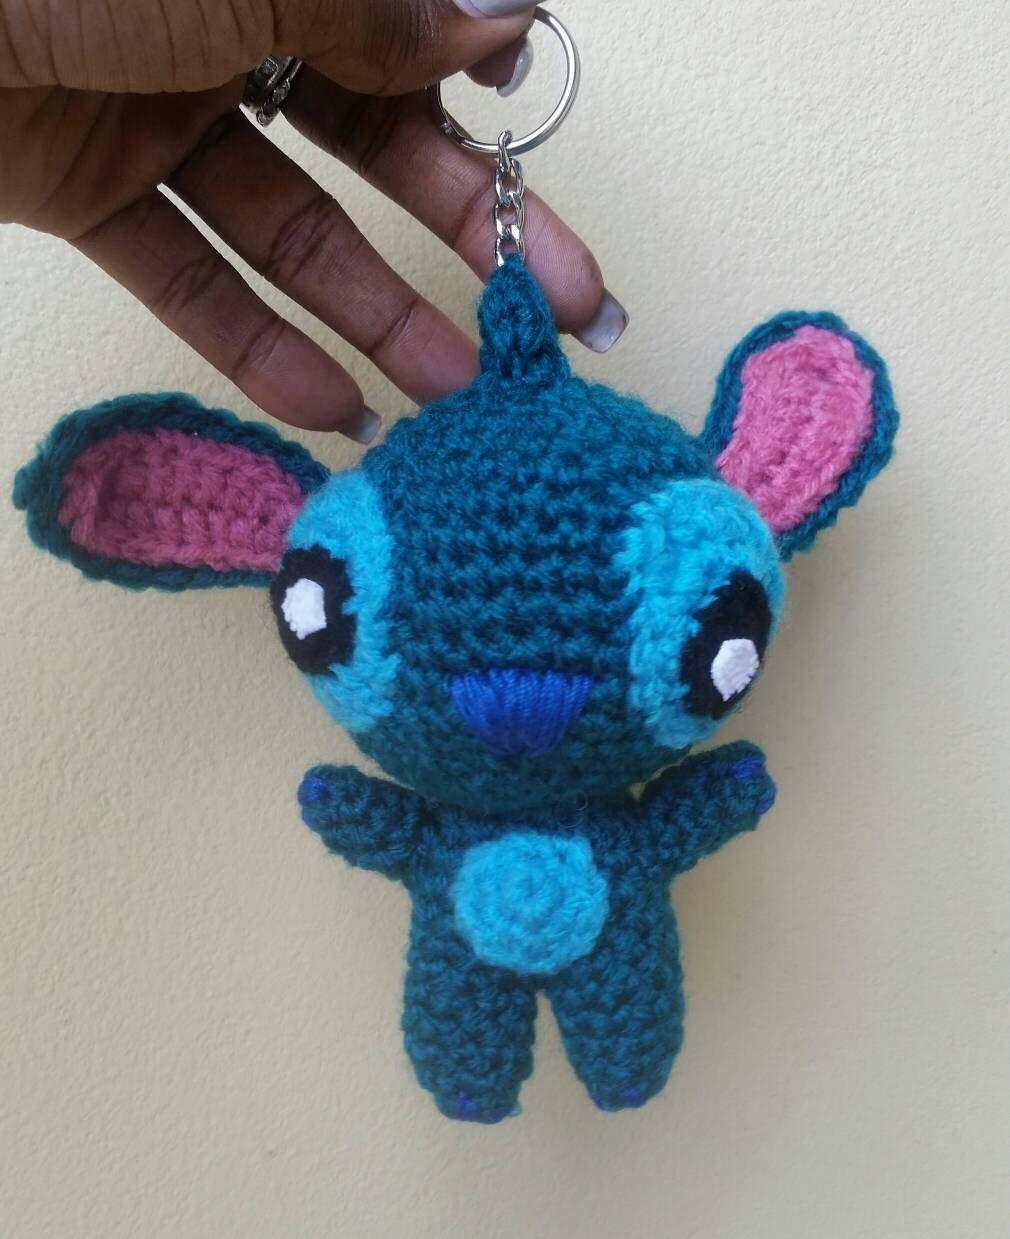 Amigurumi Keychain Loop : Crochet Lilo and Stitch Keychain/keyring Amigurumi Lilo and